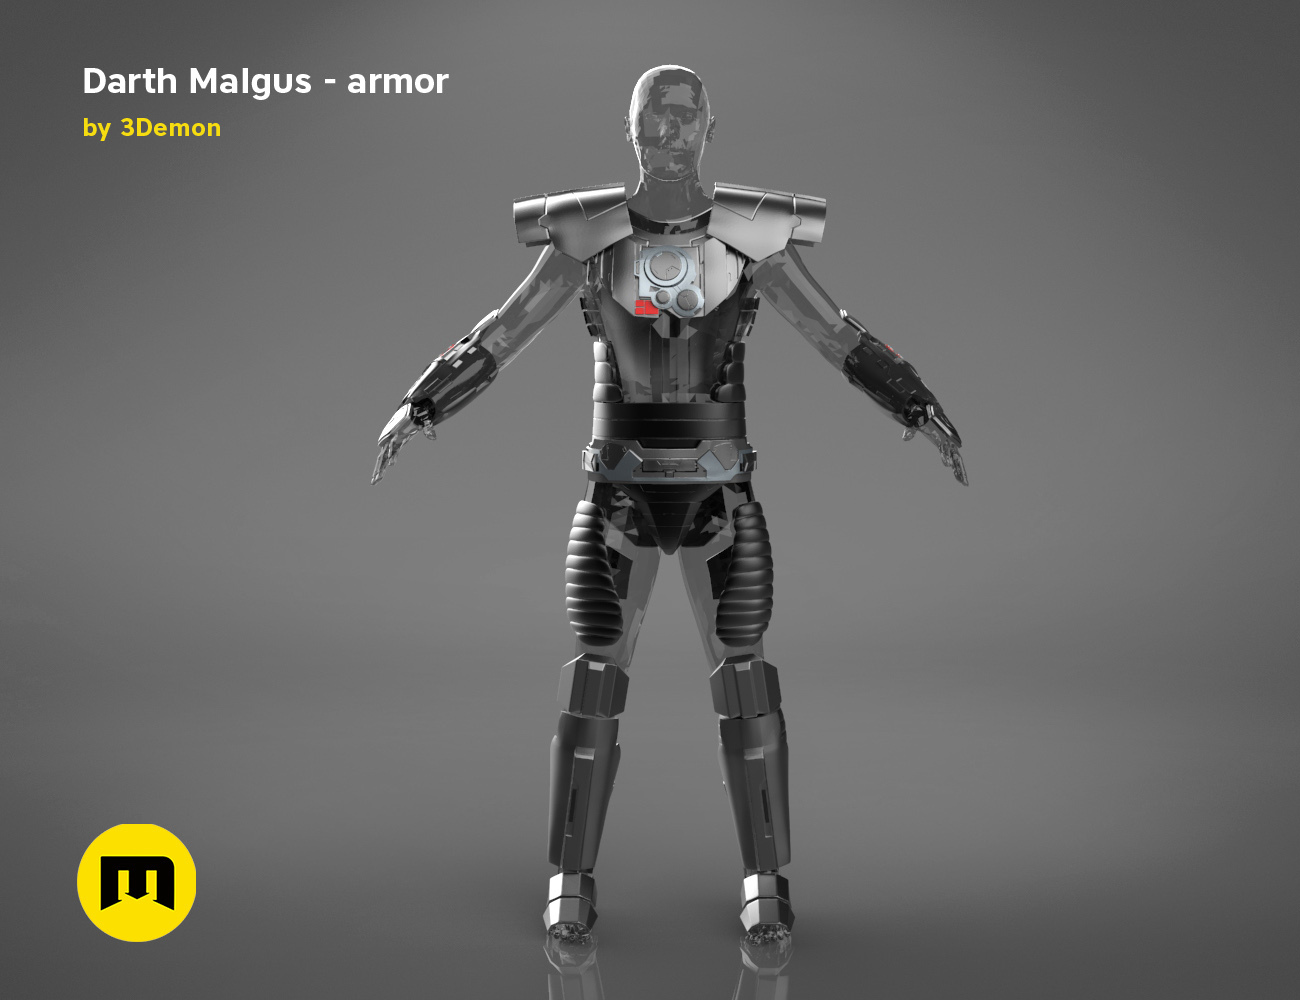 render_scene_darth-malgus-armor-color.10 kopie.jpg Download STL file Darth Malgus's full size armor • Design to 3D print, 3D-mon